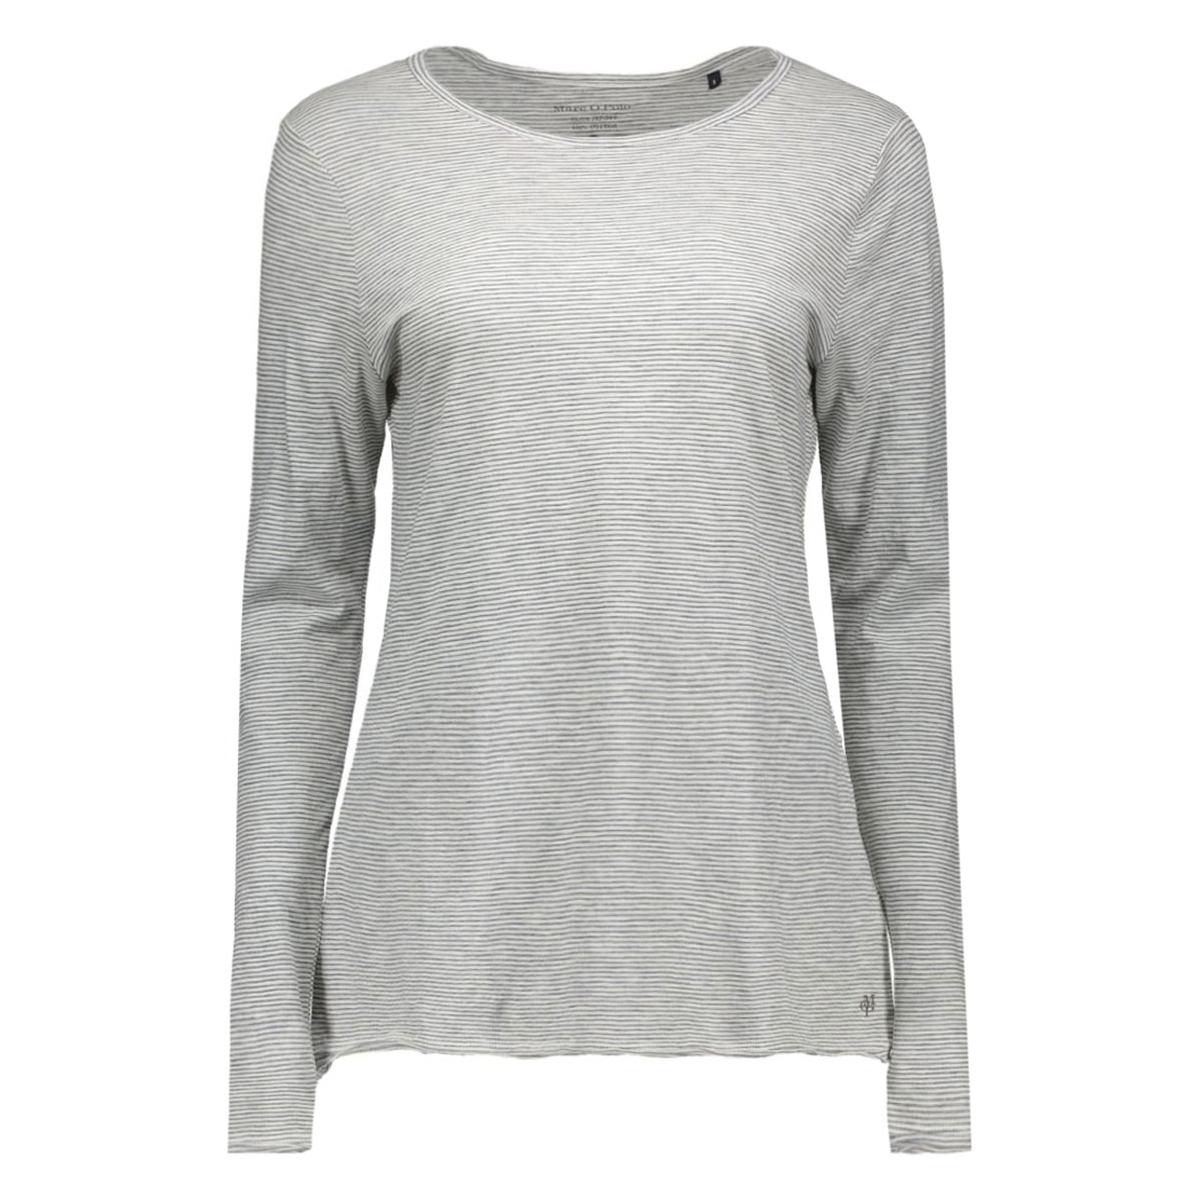 m09 2021 52861 marc o`polo t-shirt z70